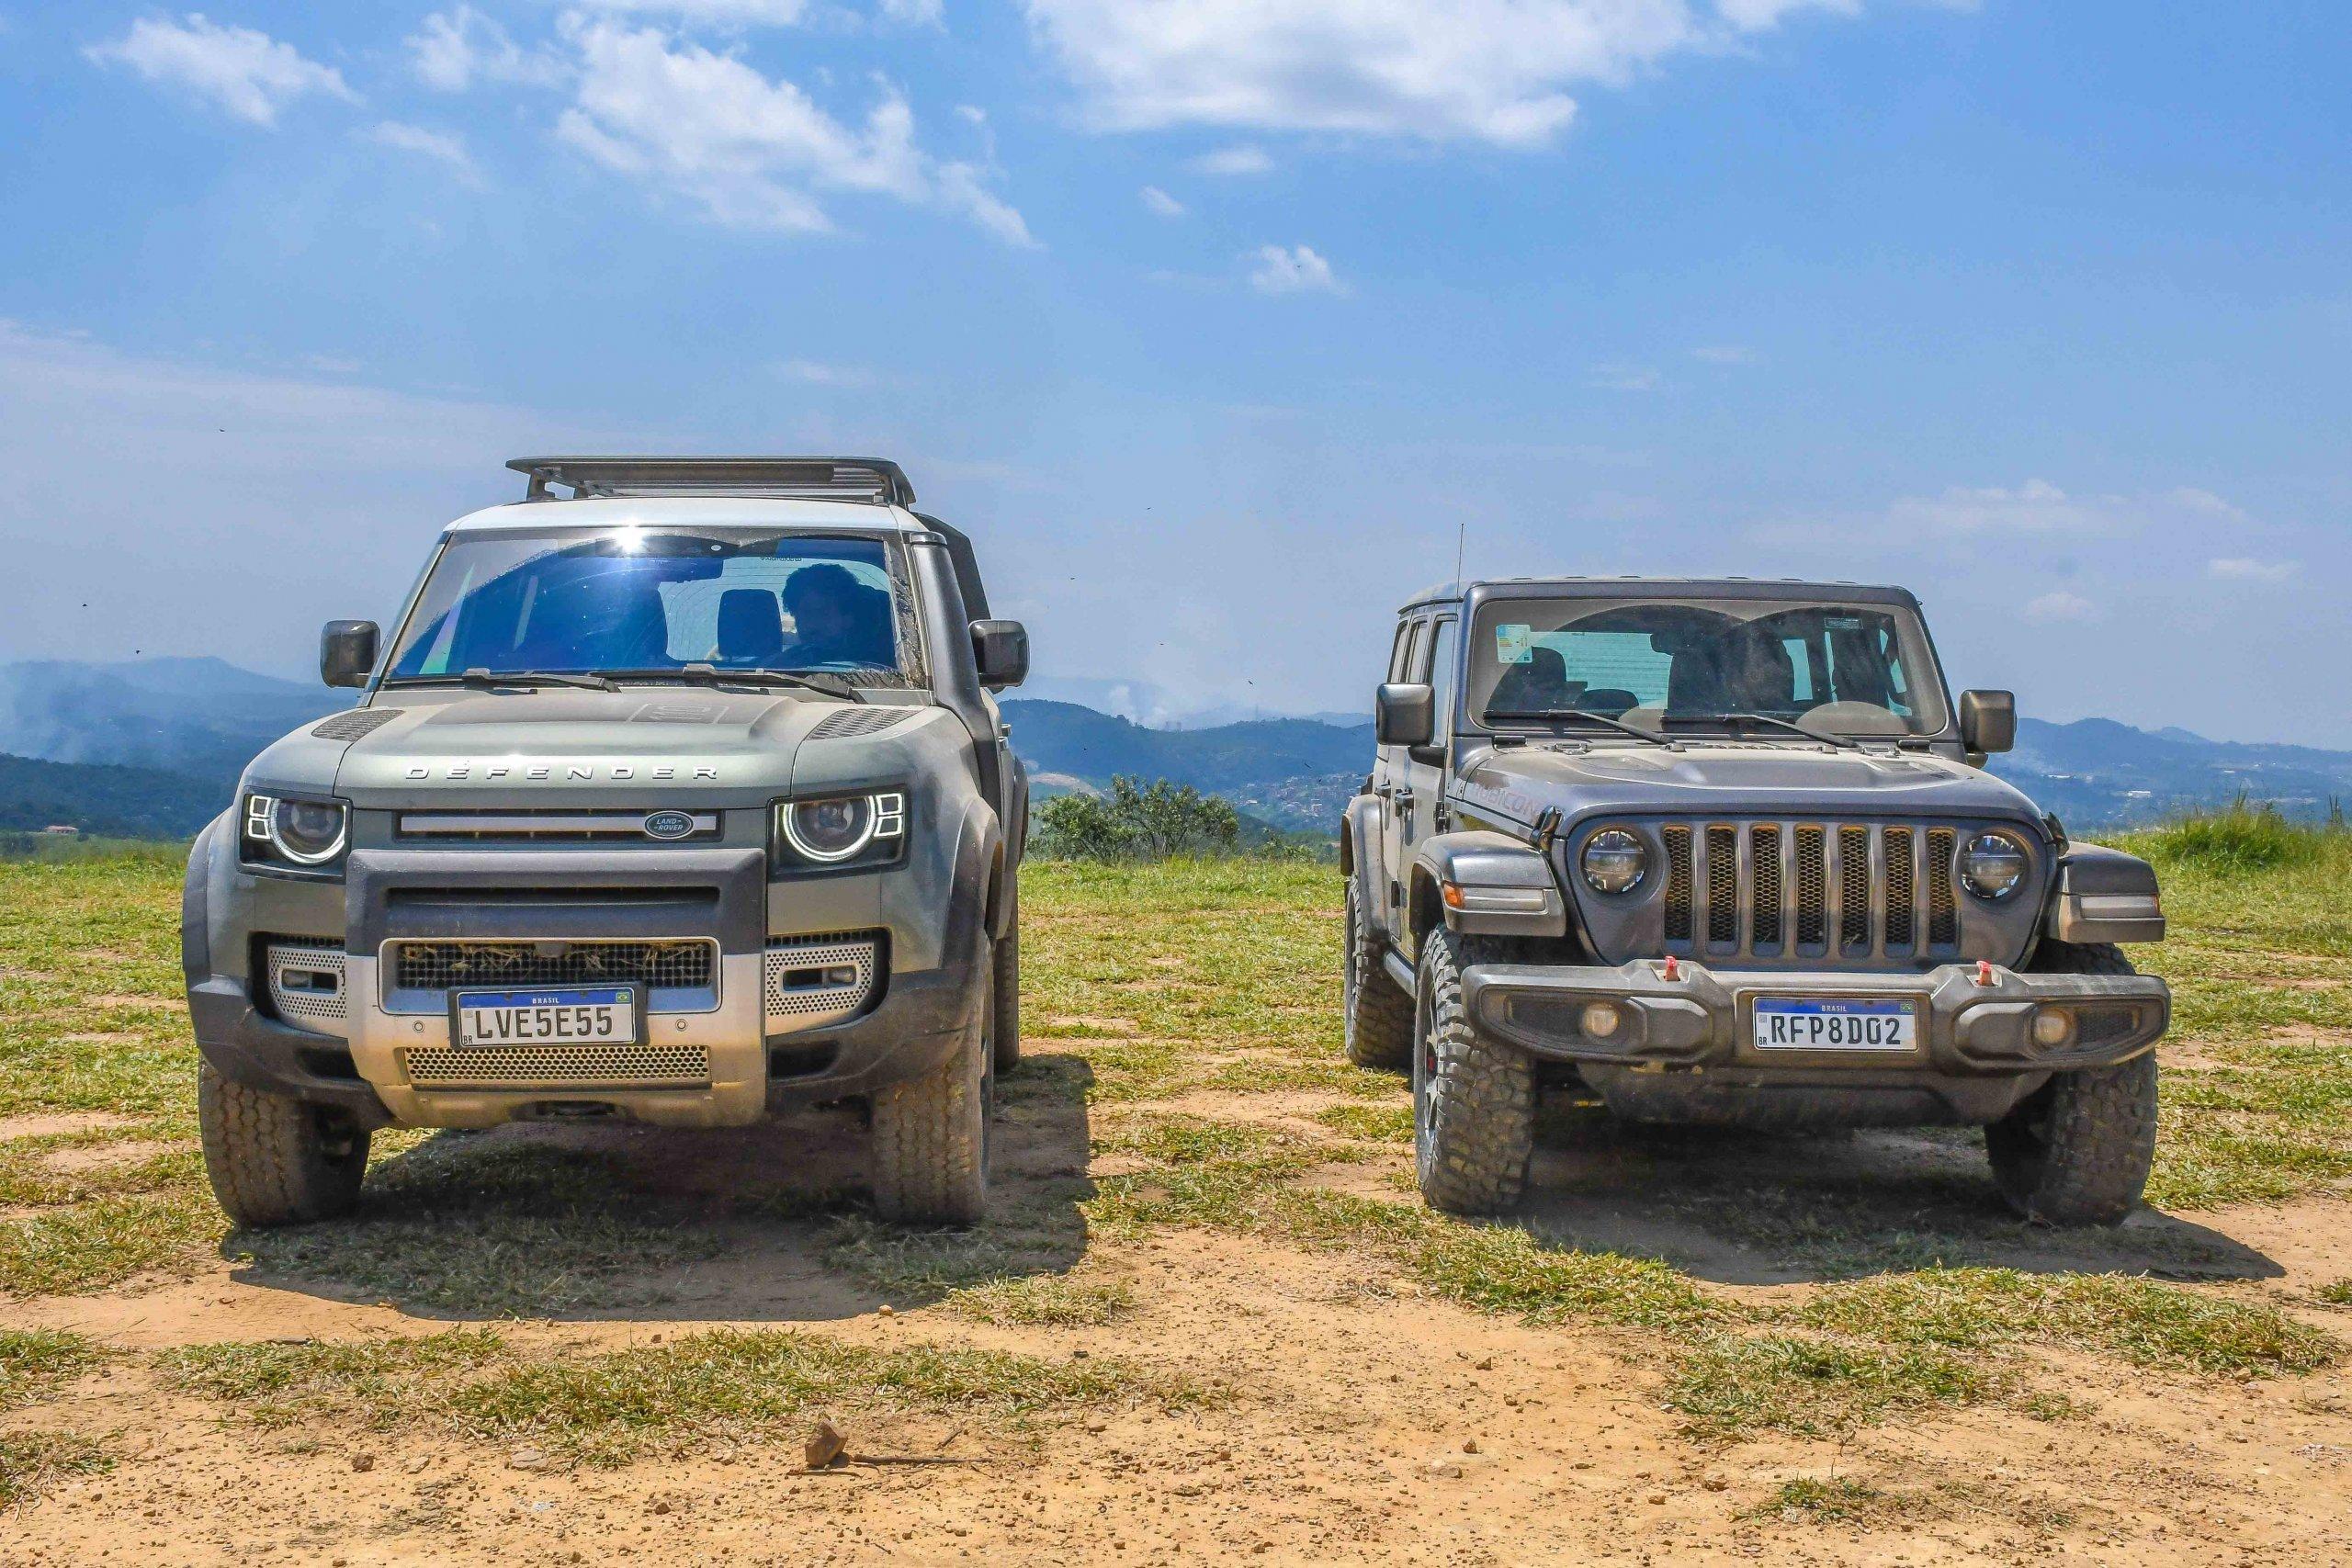 Land Rover Defender x Jeep Wrangler Rubicon